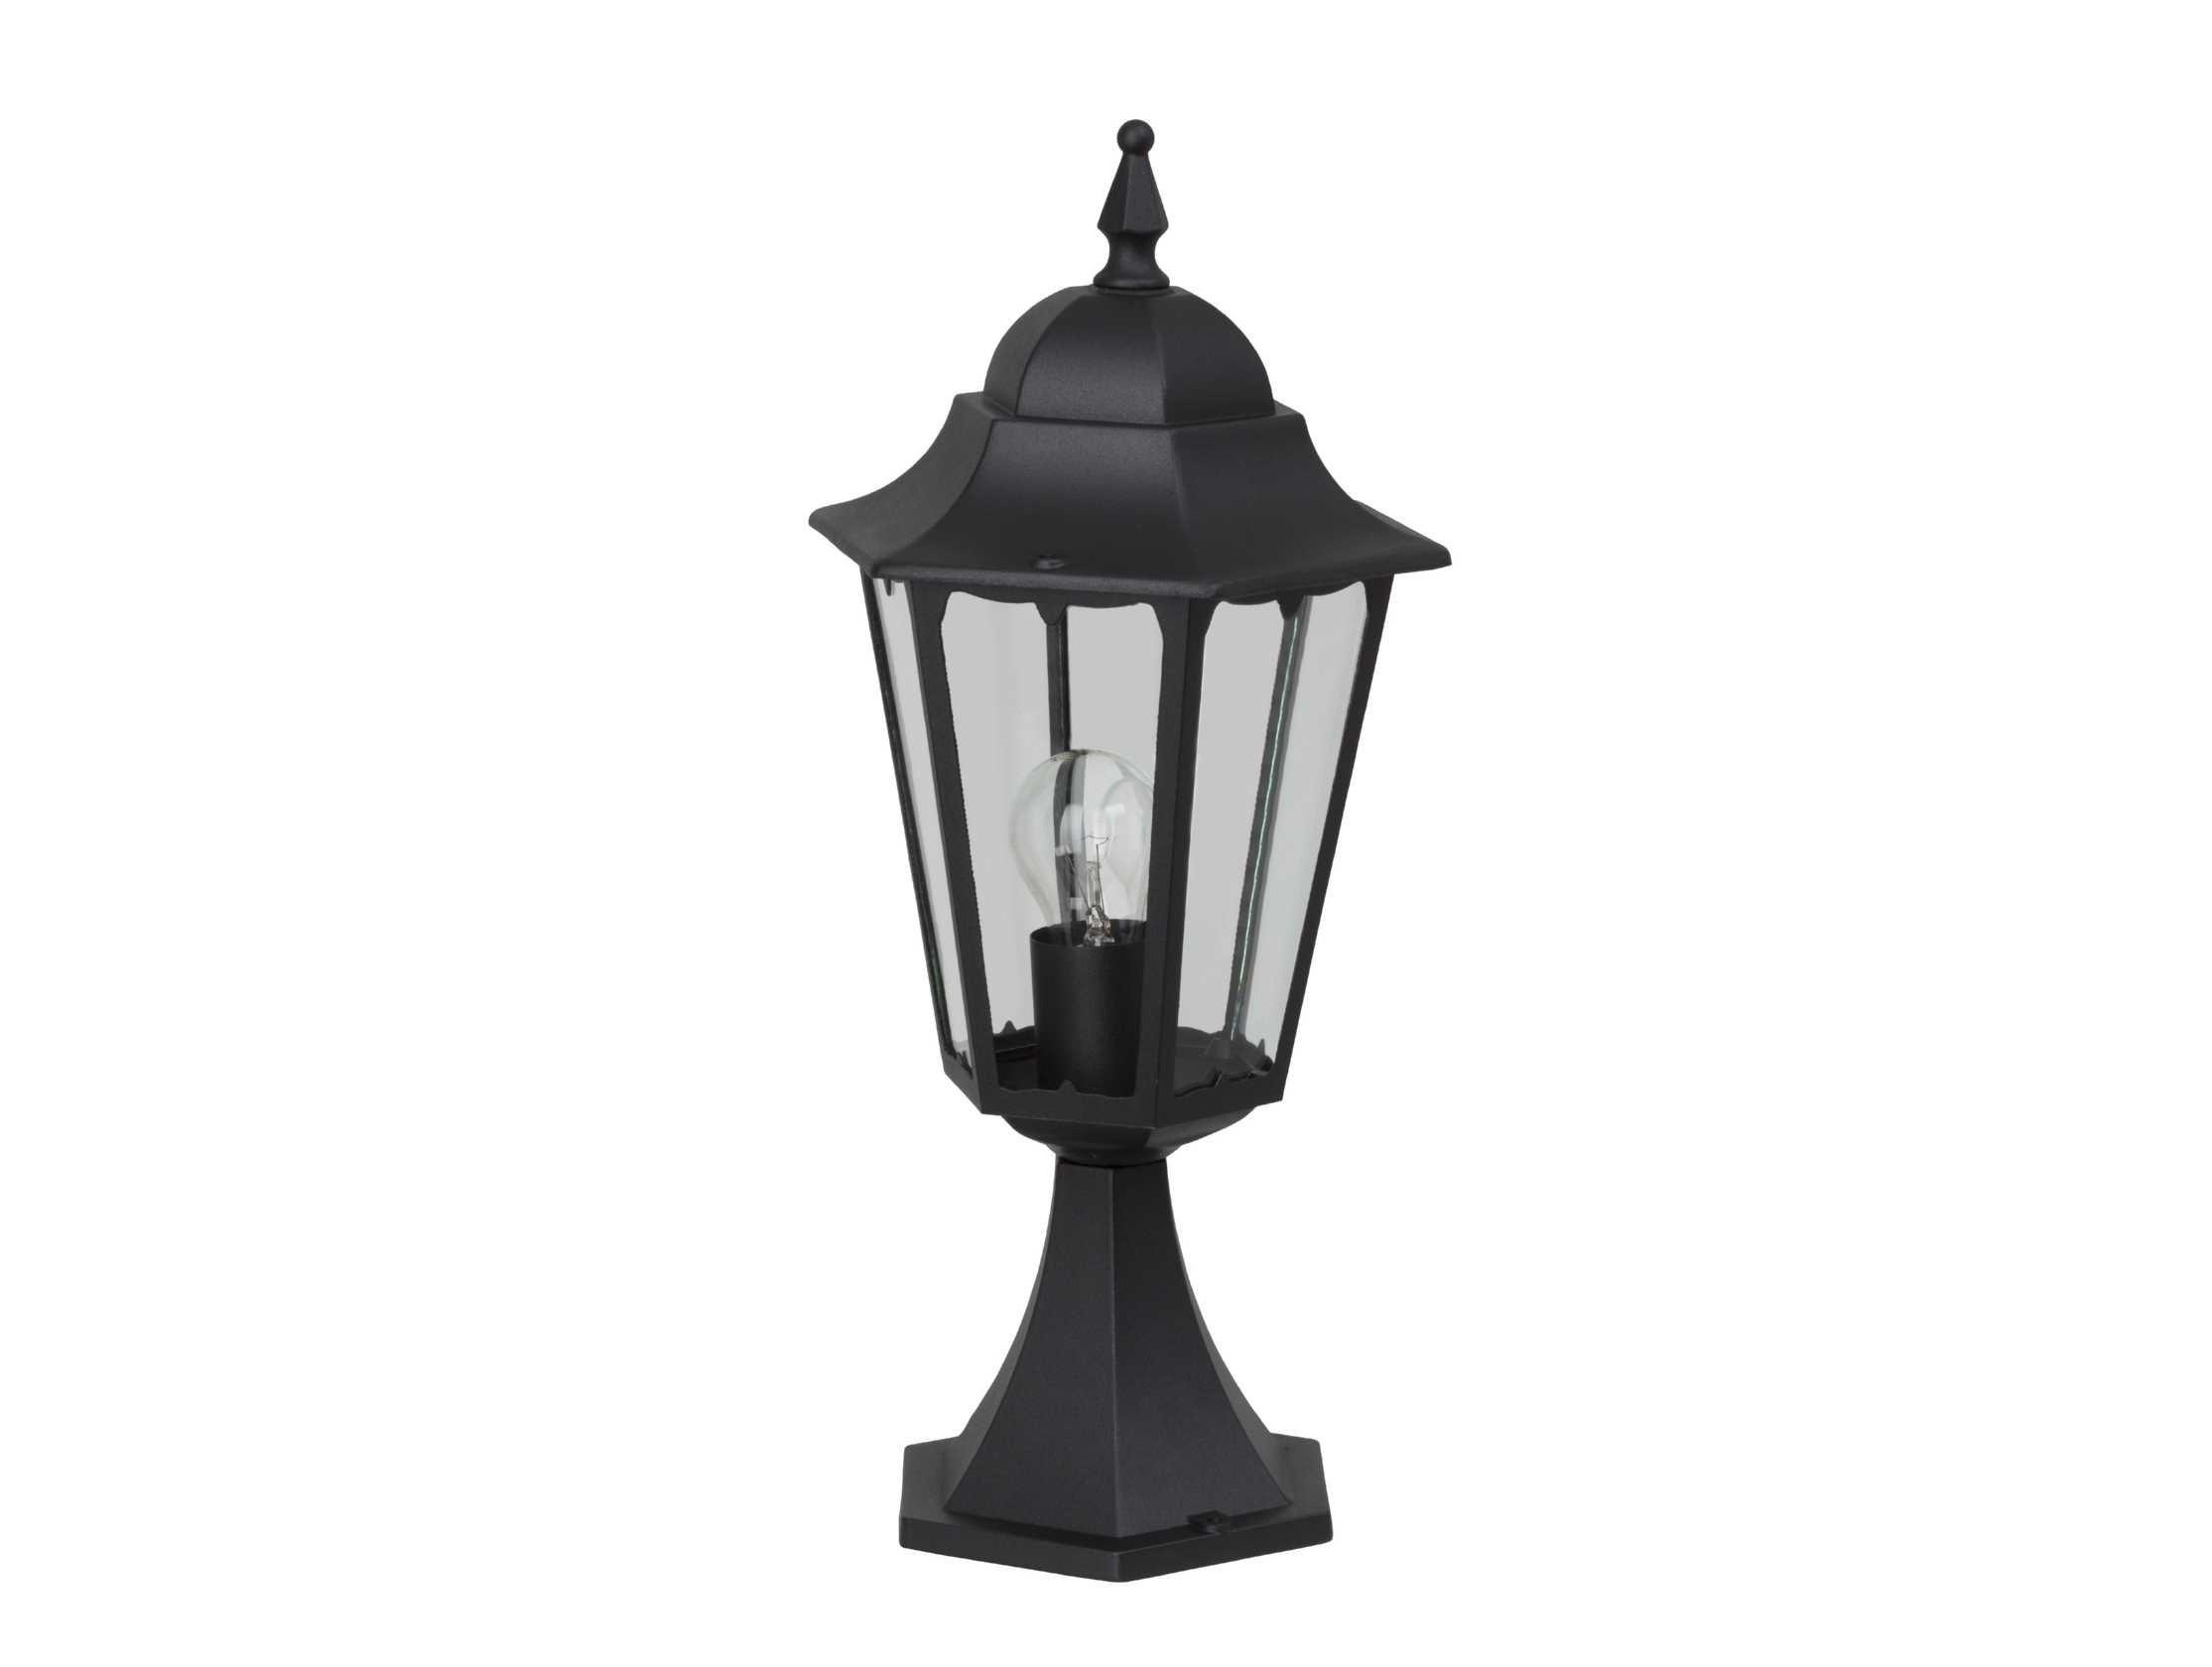 Светильник уличный CORNWALLУличные наземные светильники<br>&amp;lt;div&amp;gt;Вид цоколя: Е27&amp;lt;/div&amp;gt;&amp;lt;div&amp;gt;Мощность лампы: 60W&amp;lt;/div&amp;gt;&amp;lt;div&amp;gt;Количество ламп: 1&amp;lt;/div&amp;gt;&amp;lt;div&amp;gt;Наличие ламп: нет&amp;lt;/div&amp;gt;<br><br>Material: Стекло<br>Height см: 46<br>Diameter см: 19